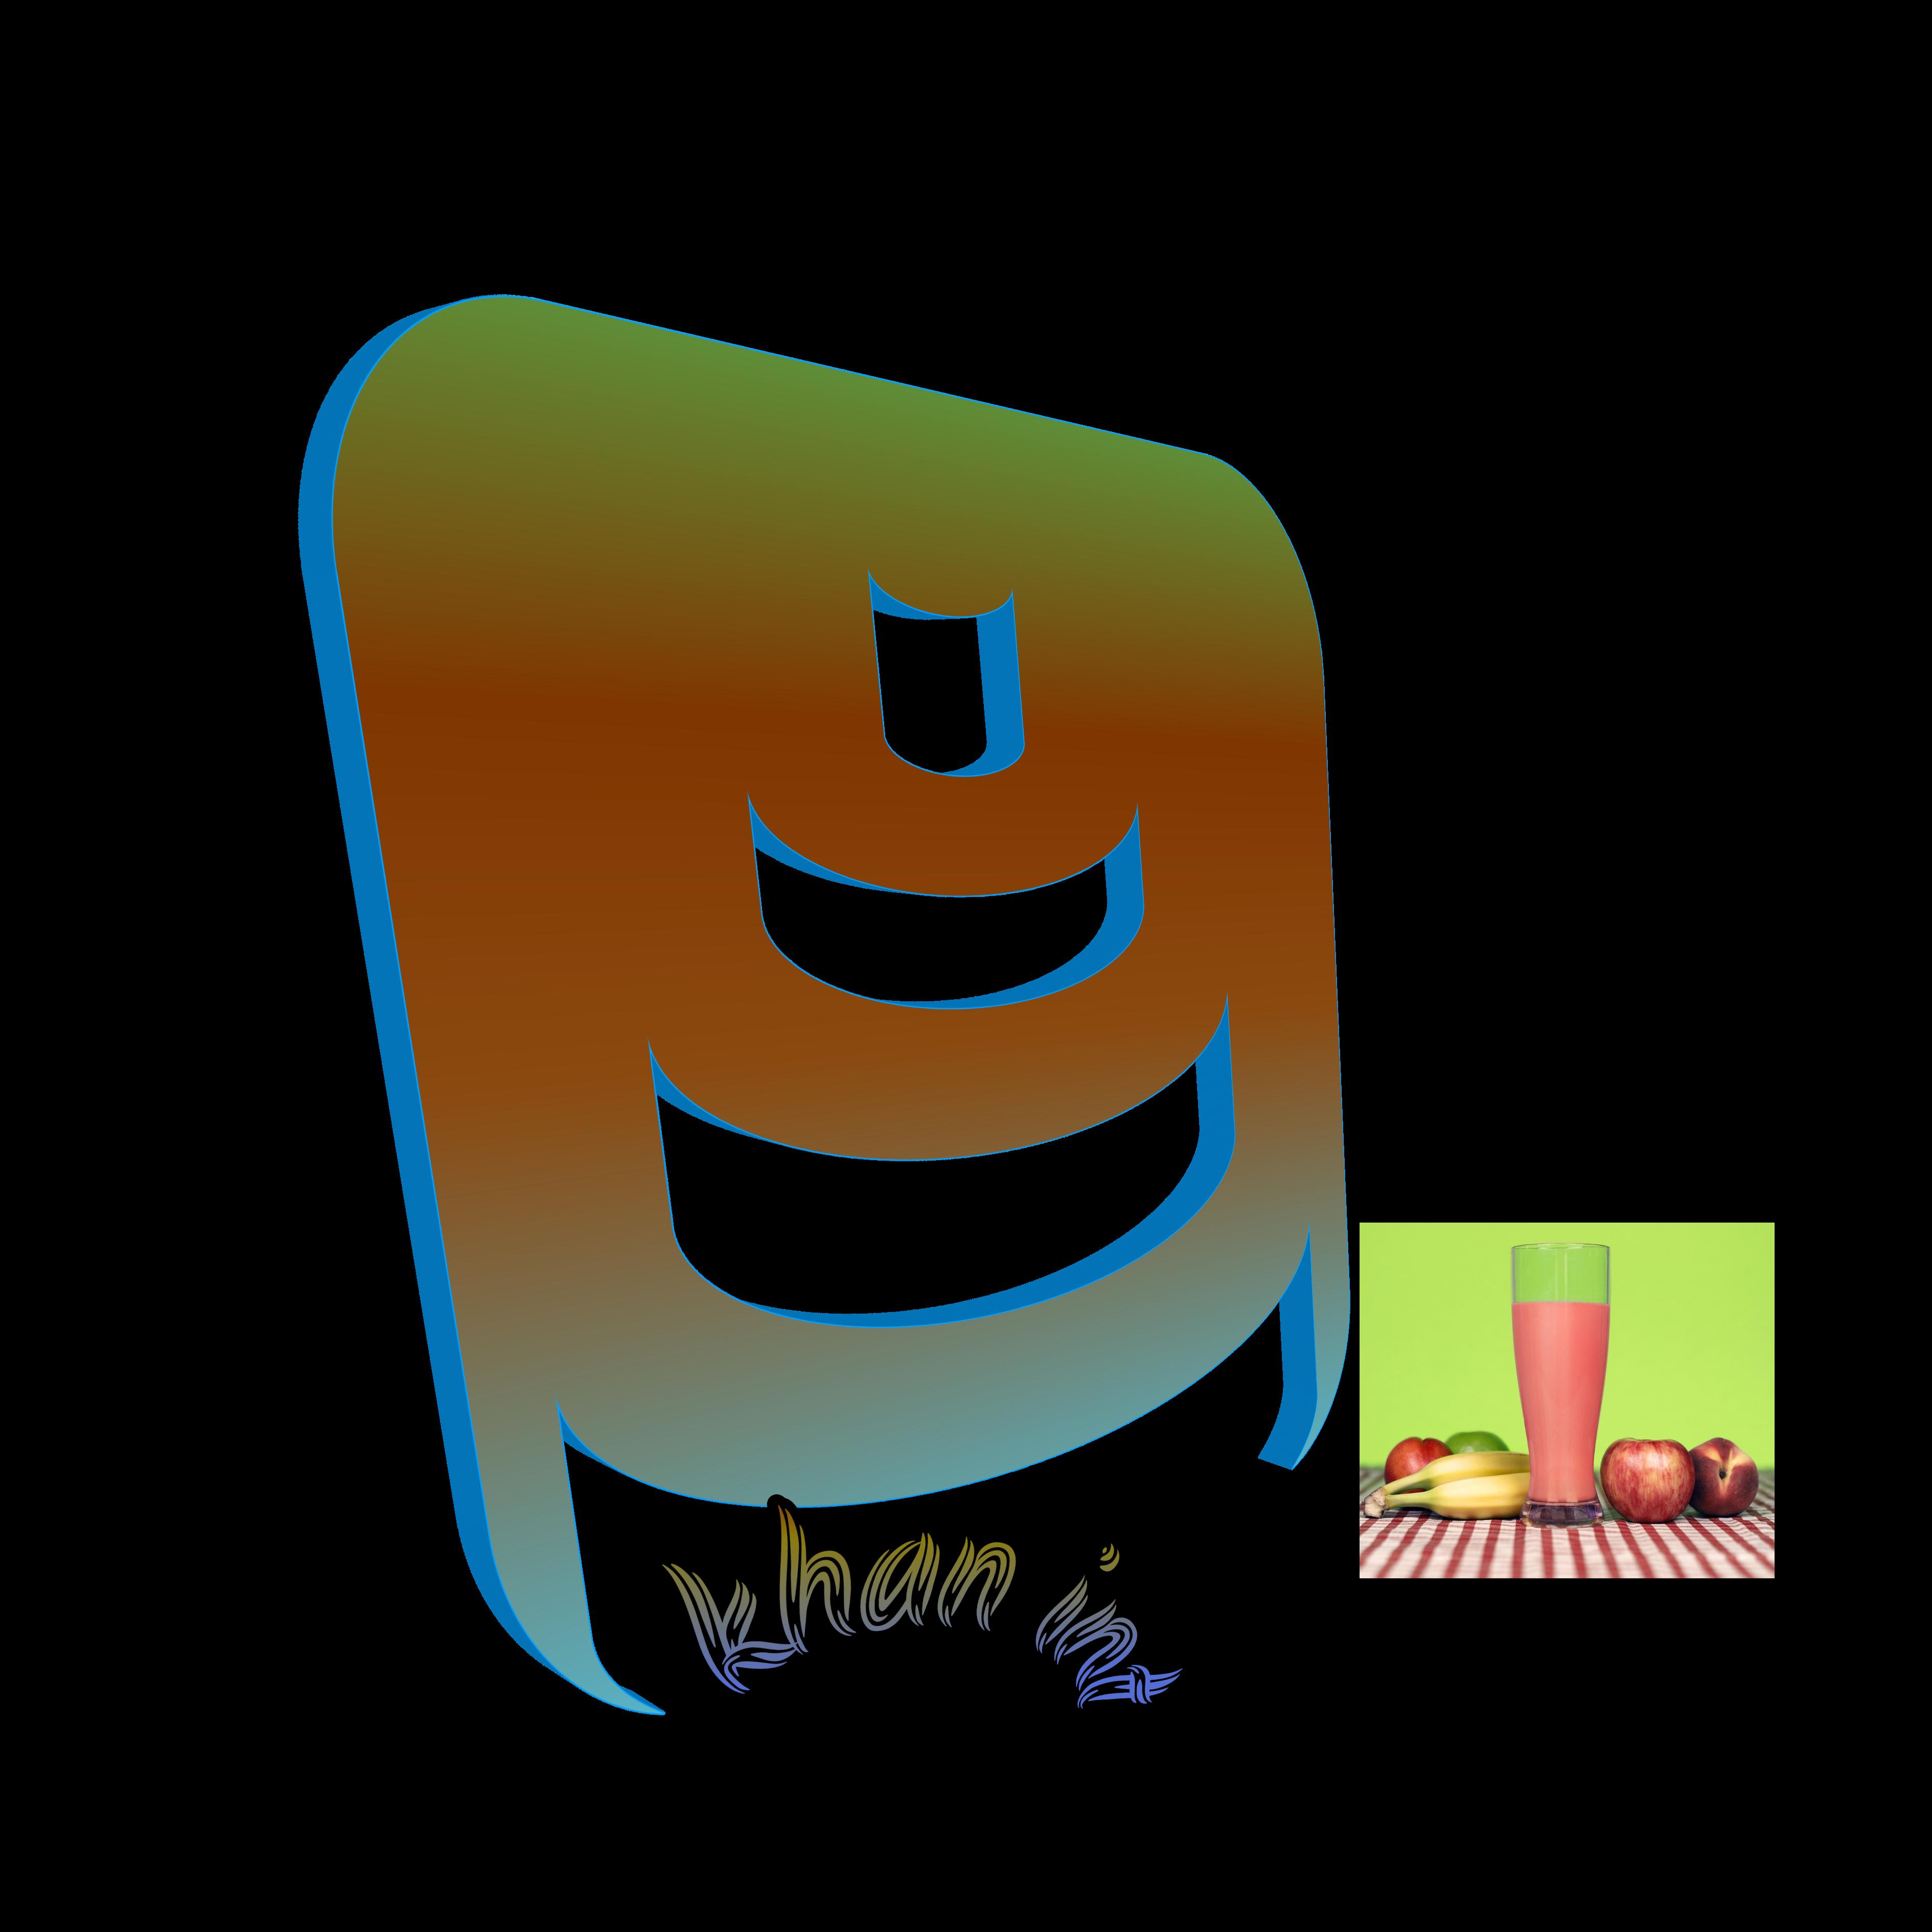 I will create best logo design in short time